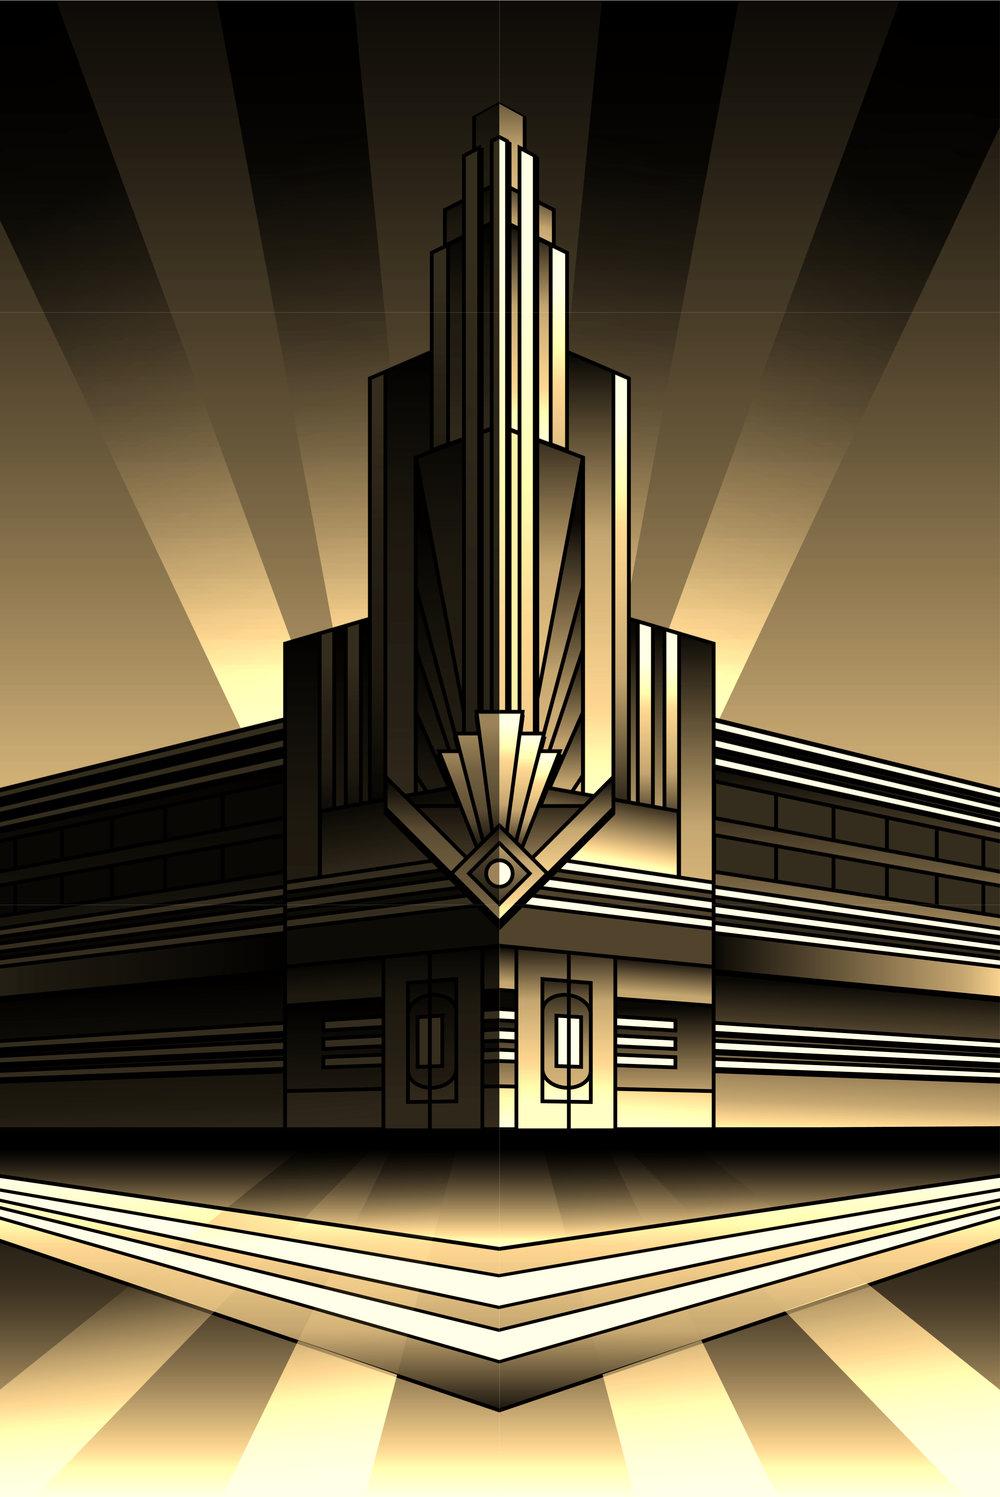 Deco Building 3.jpg